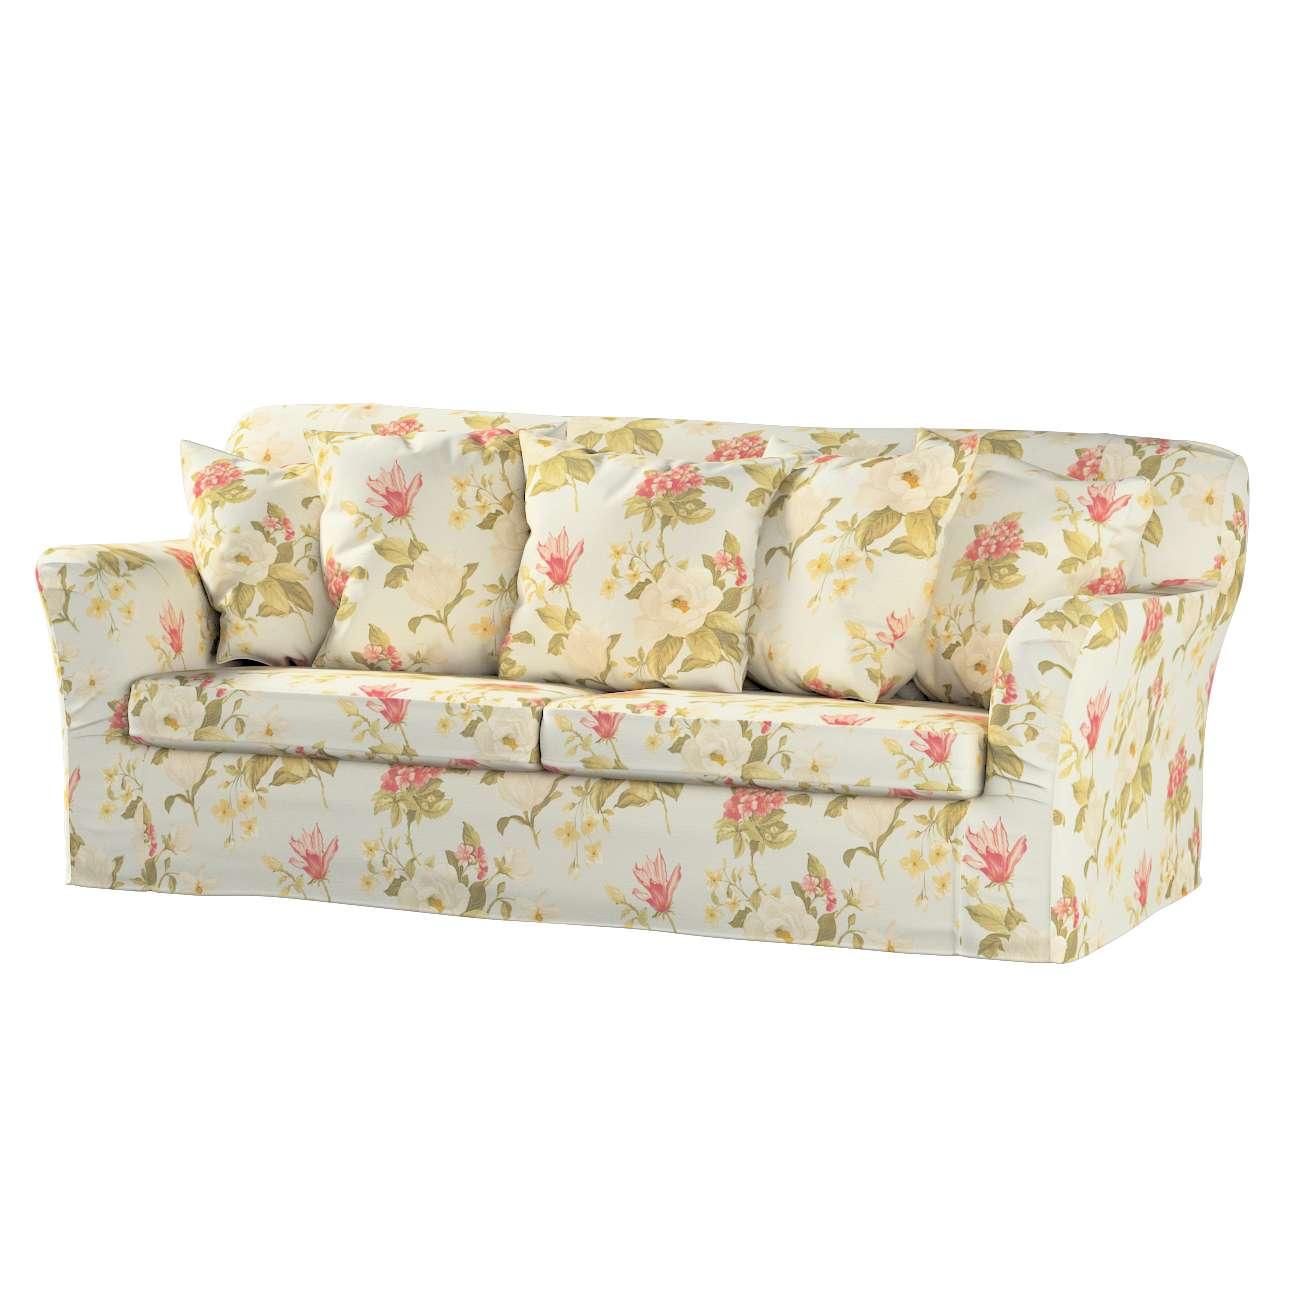 tomelilla schlafsofabezug normale gr e helllblau dekoria. Black Bedroom Furniture Sets. Home Design Ideas